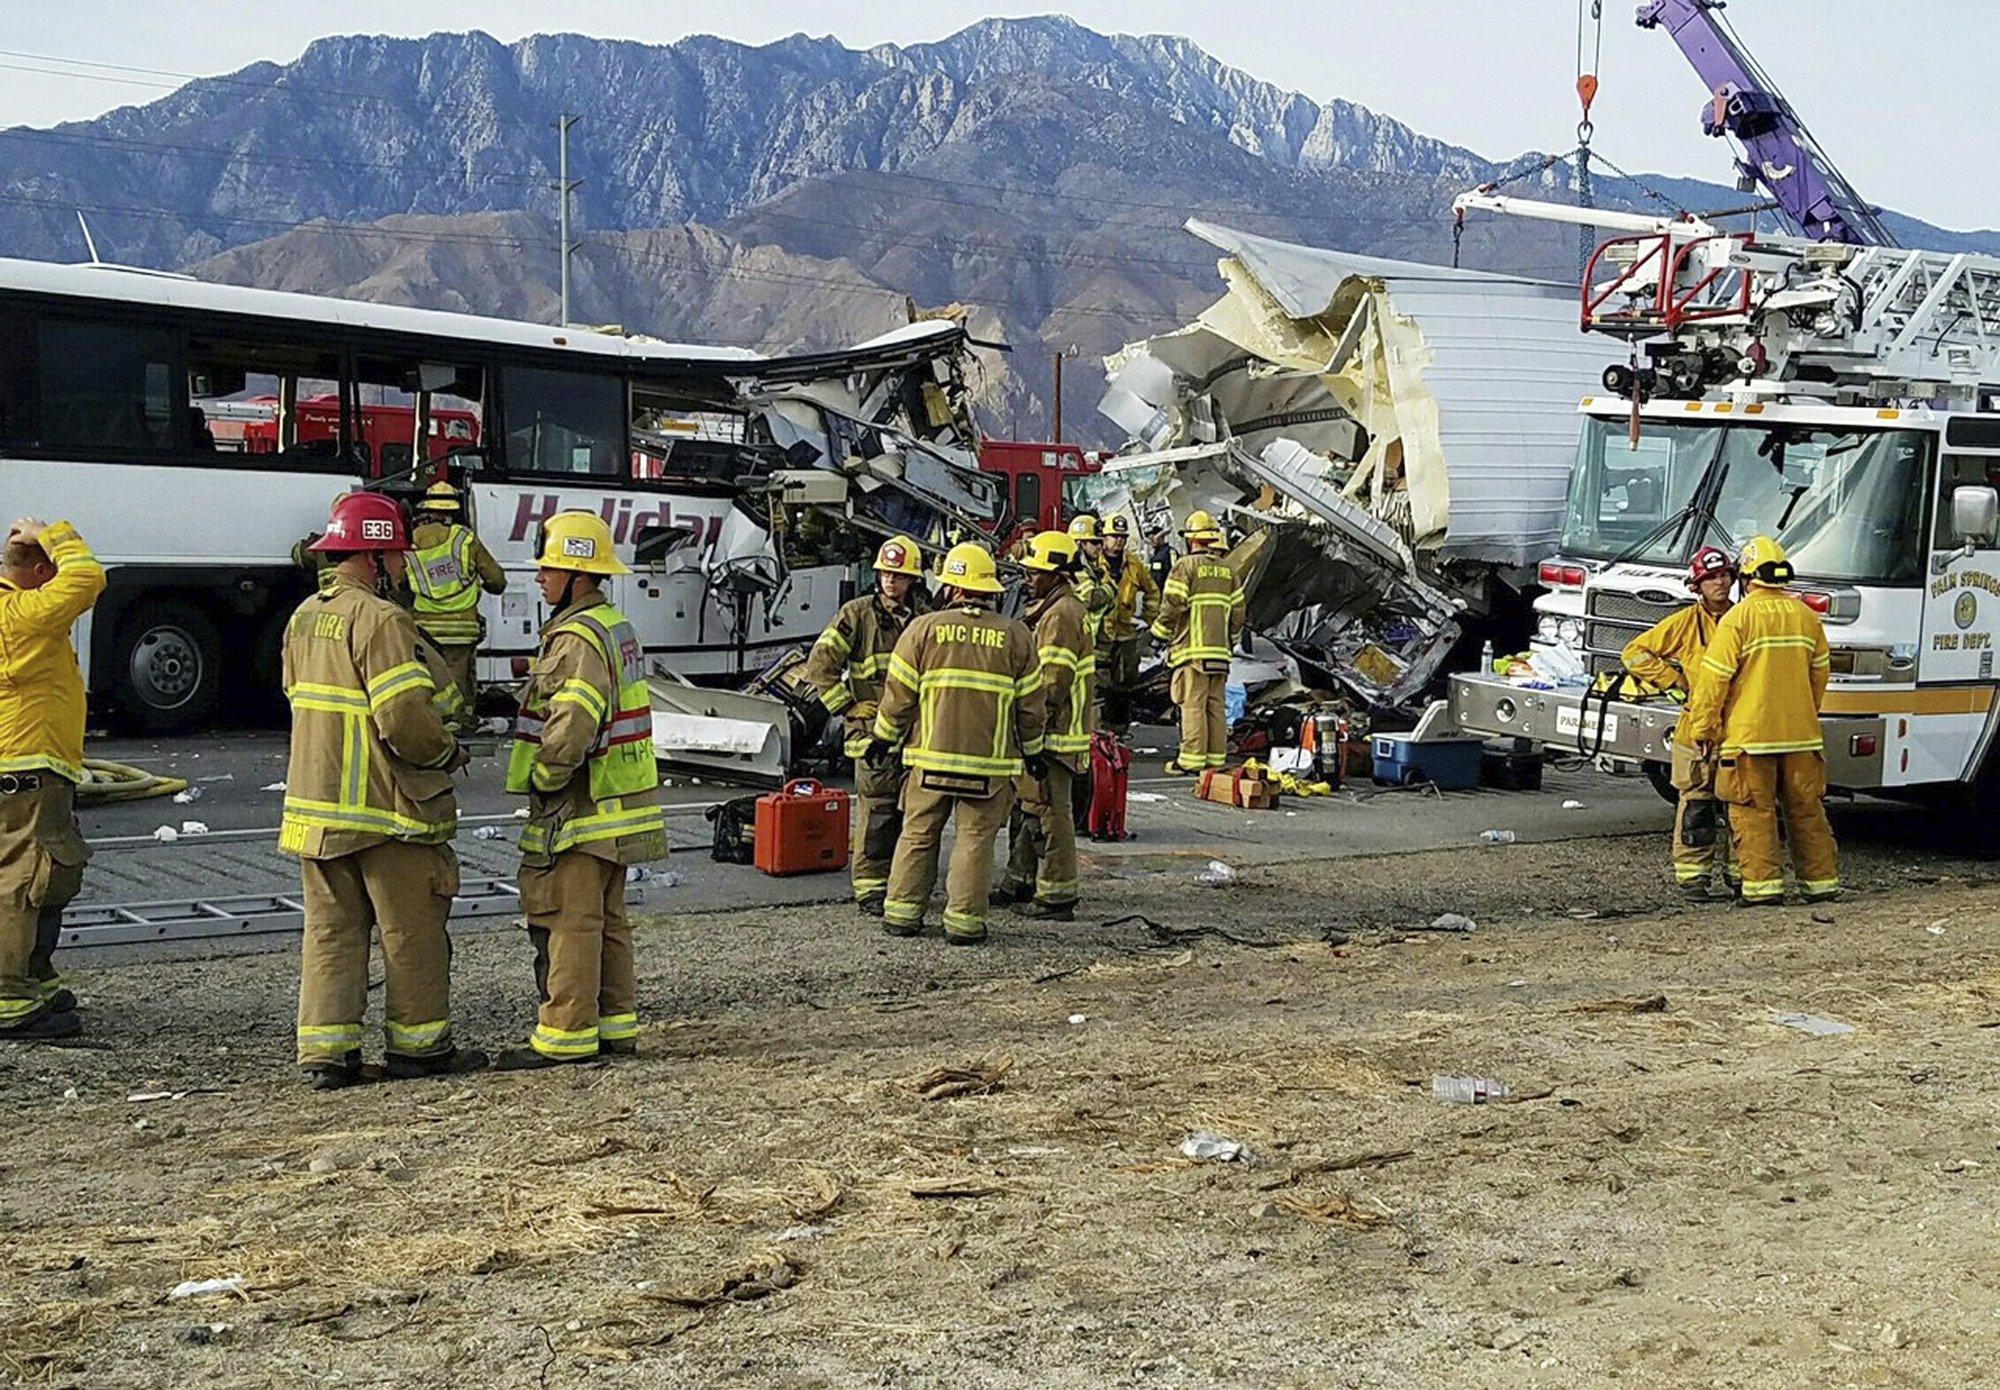 Valley view casino bus accident 4 winds casino il